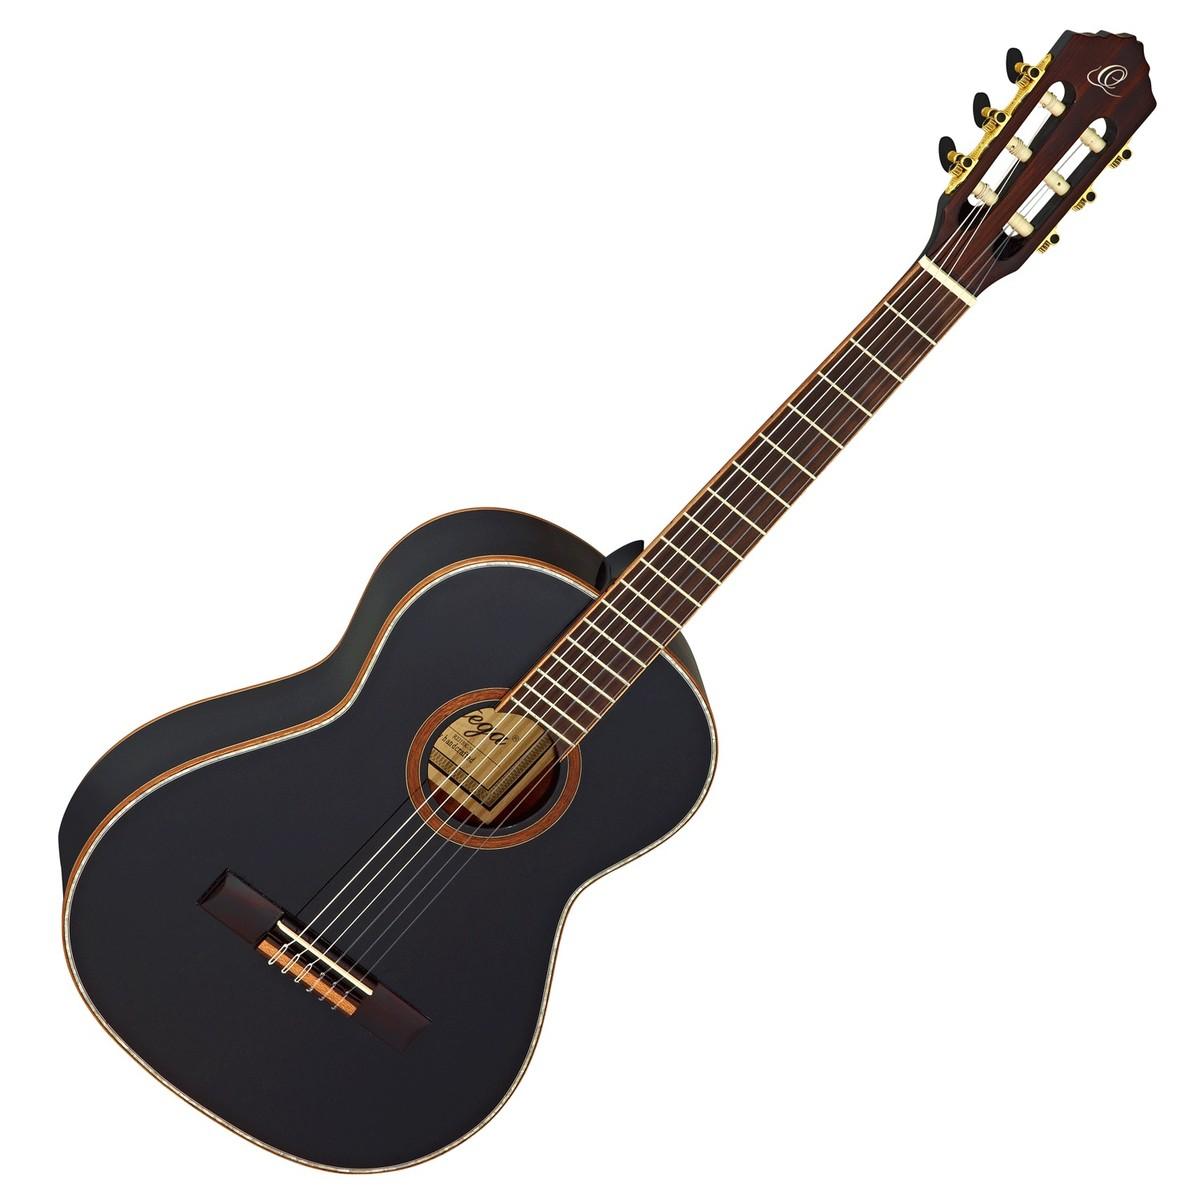 guitare classique de ortega r221bk 3 4 noir. Black Bedroom Furniture Sets. Home Design Ideas